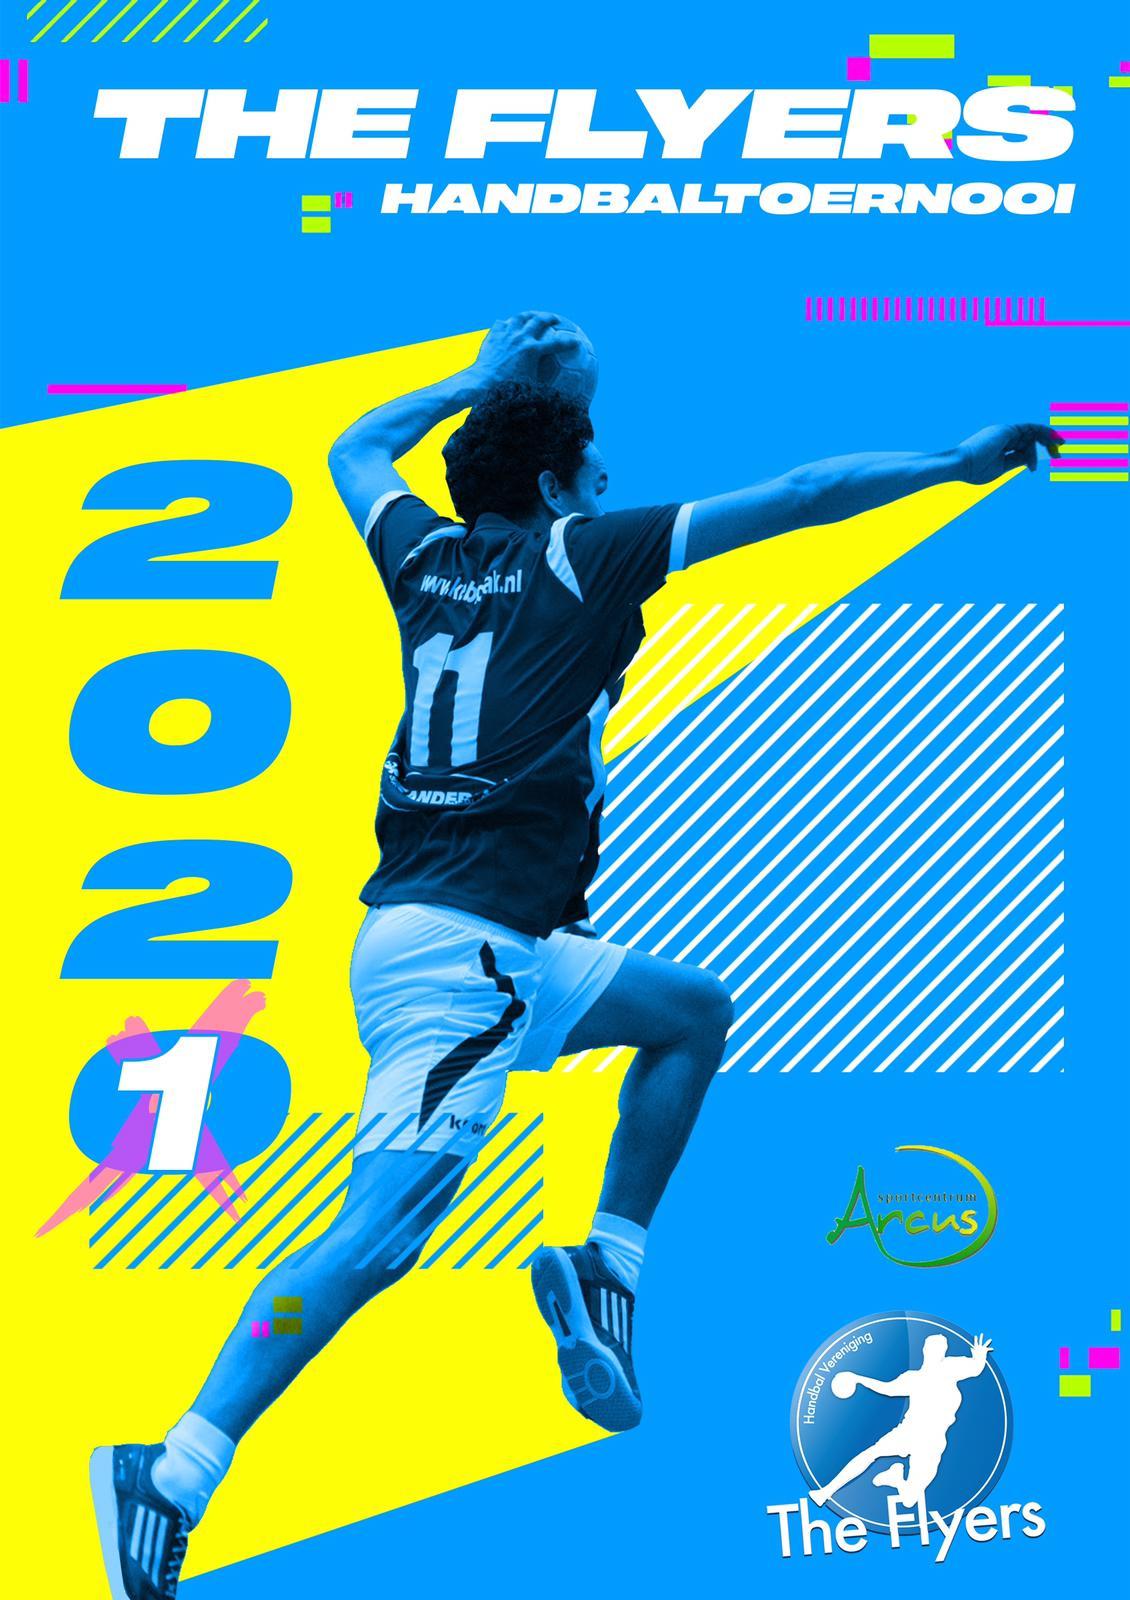 Flyers-Arcus Zaalhandbal Toernooi Annulering The Flyers-Arcus Zaalhandbaltoernooi 2020